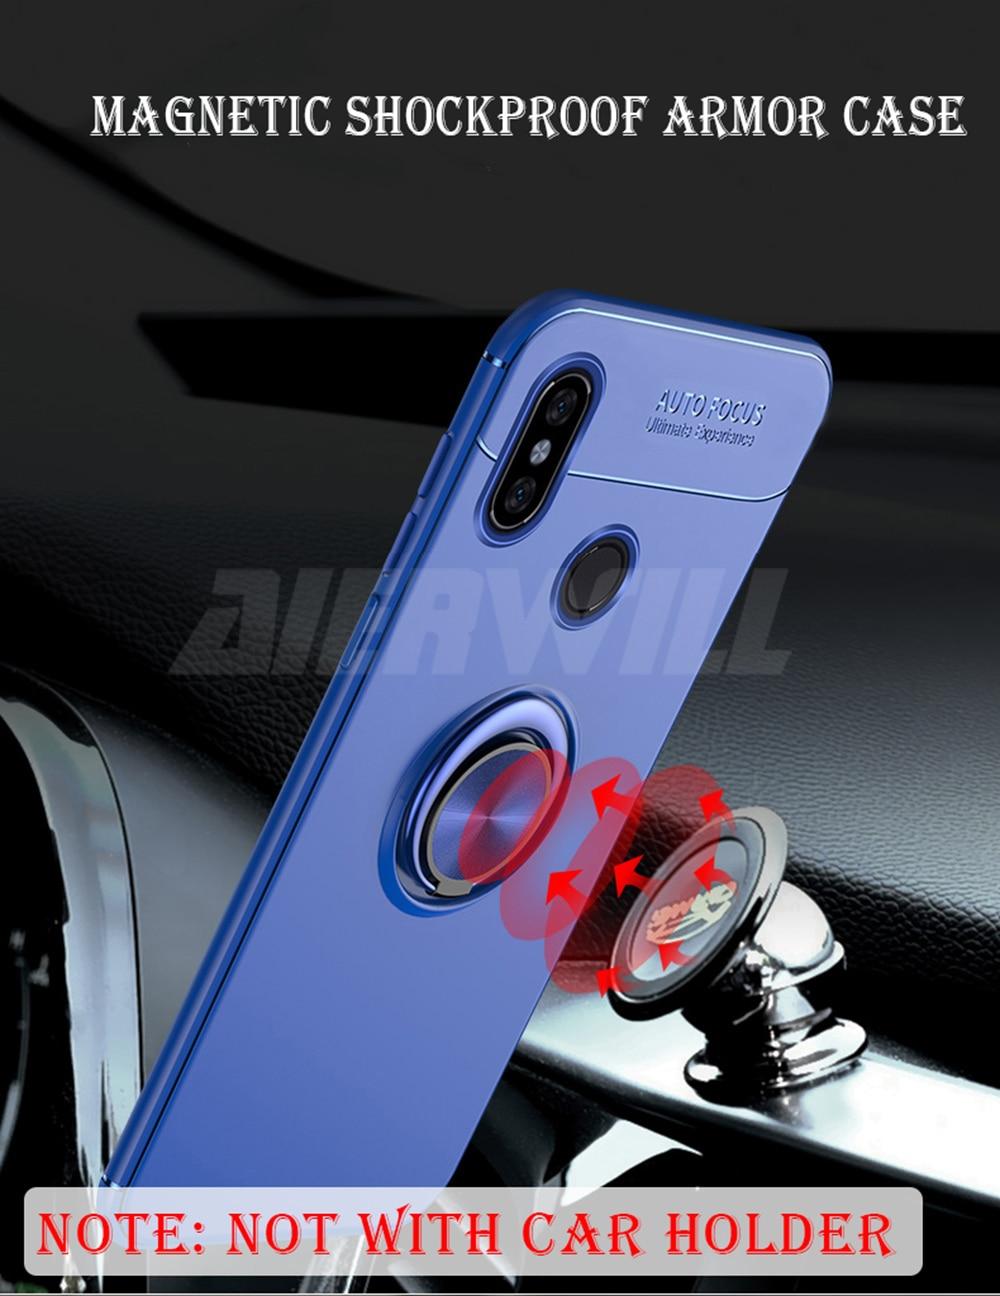 HTB1erzcXozrK1RjSspmq6AOdFXa7 Armor case For Xiaomi Mi Max 3 Case Protective Bumper Finger Ring Holder Soft Silicone Matte Back Cover For Xiaomi max 3 Cases